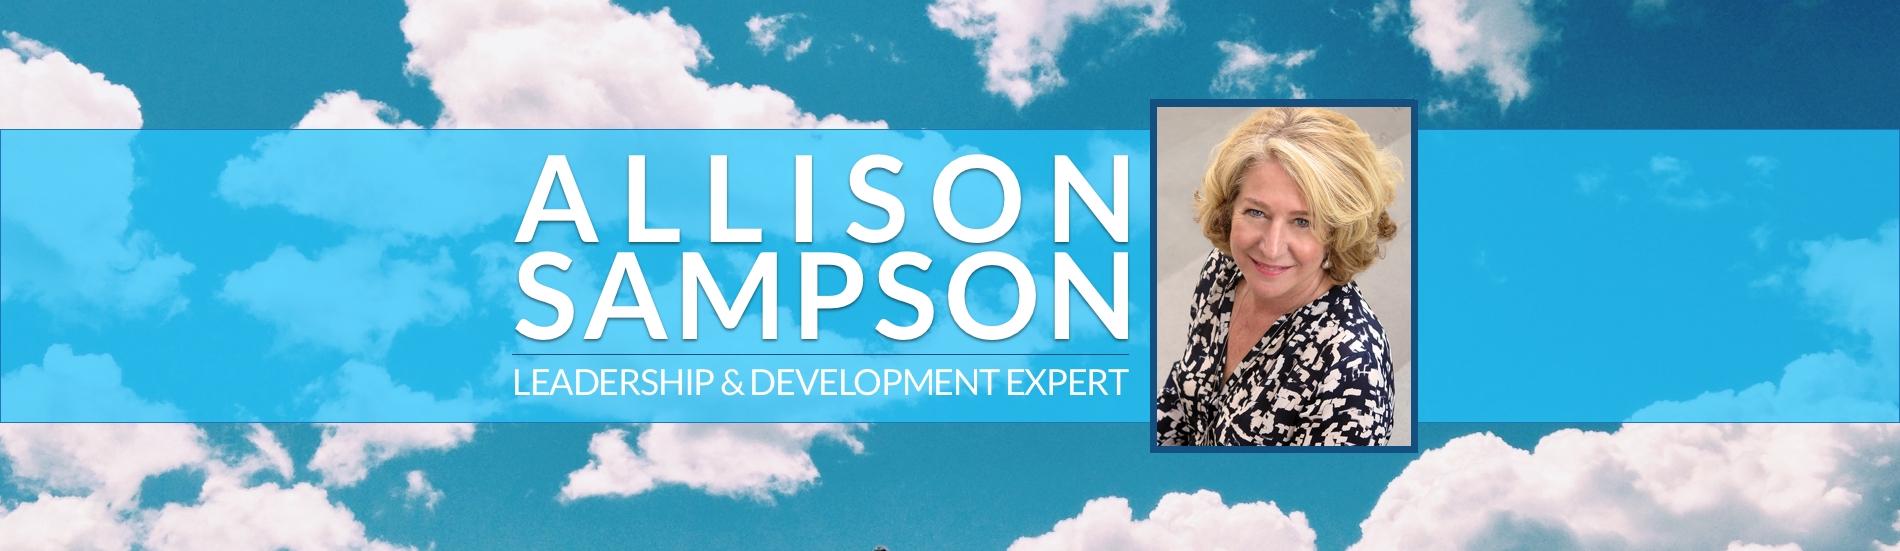 Allison Sampson banner with photo of Allison Sampson